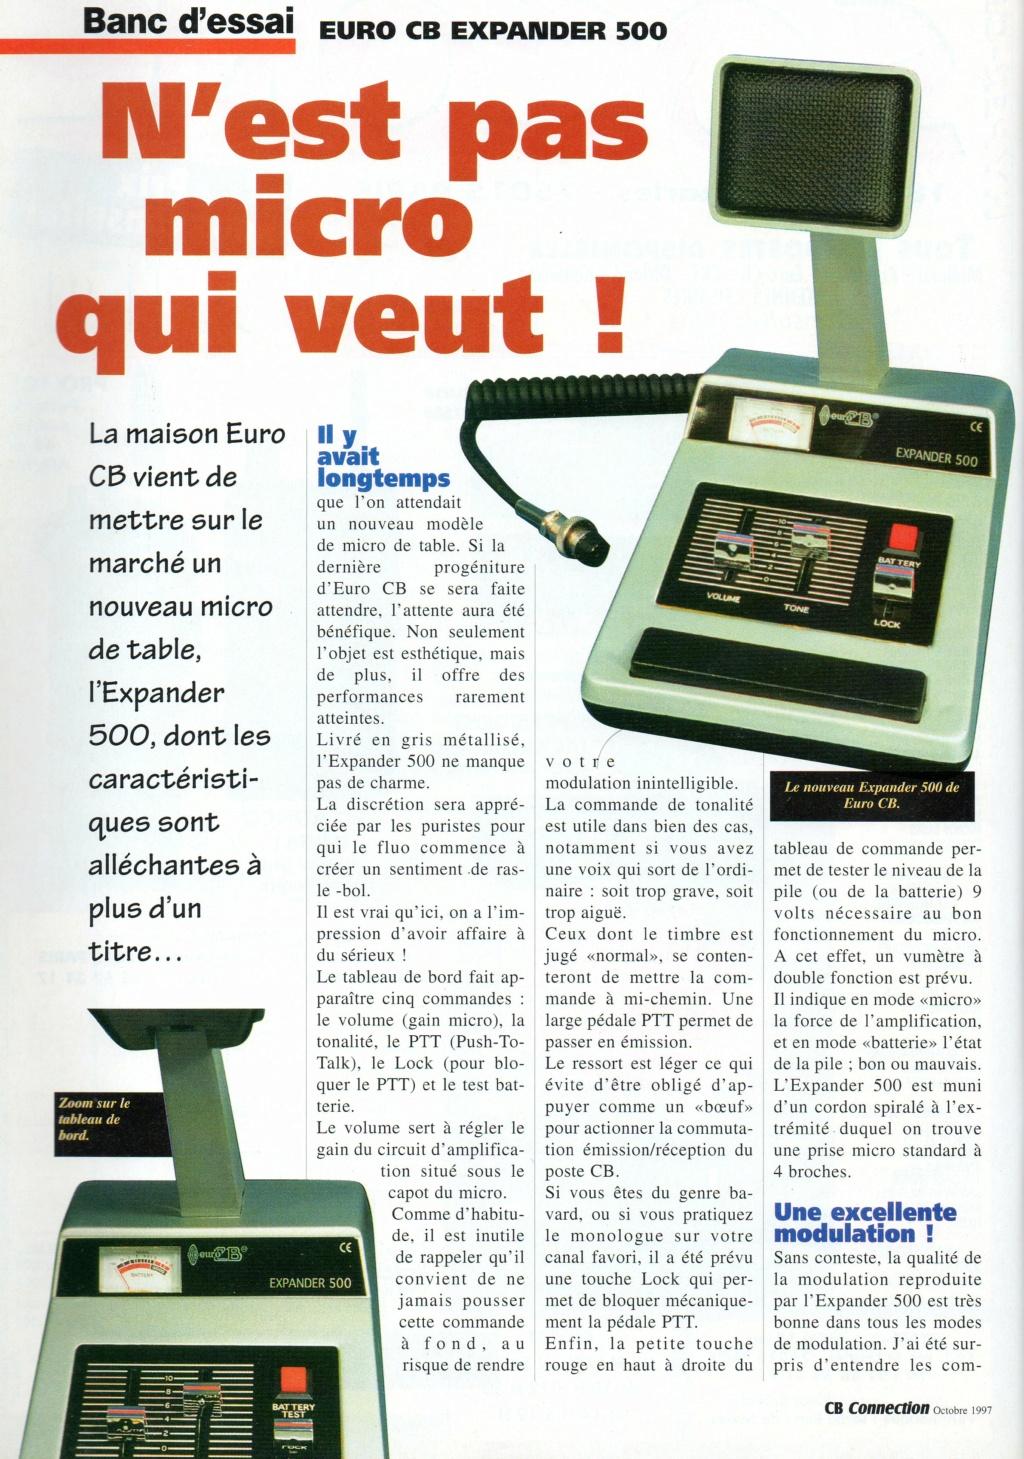 EuroCB - Turner Expander 500 (Micro de table) Chora587